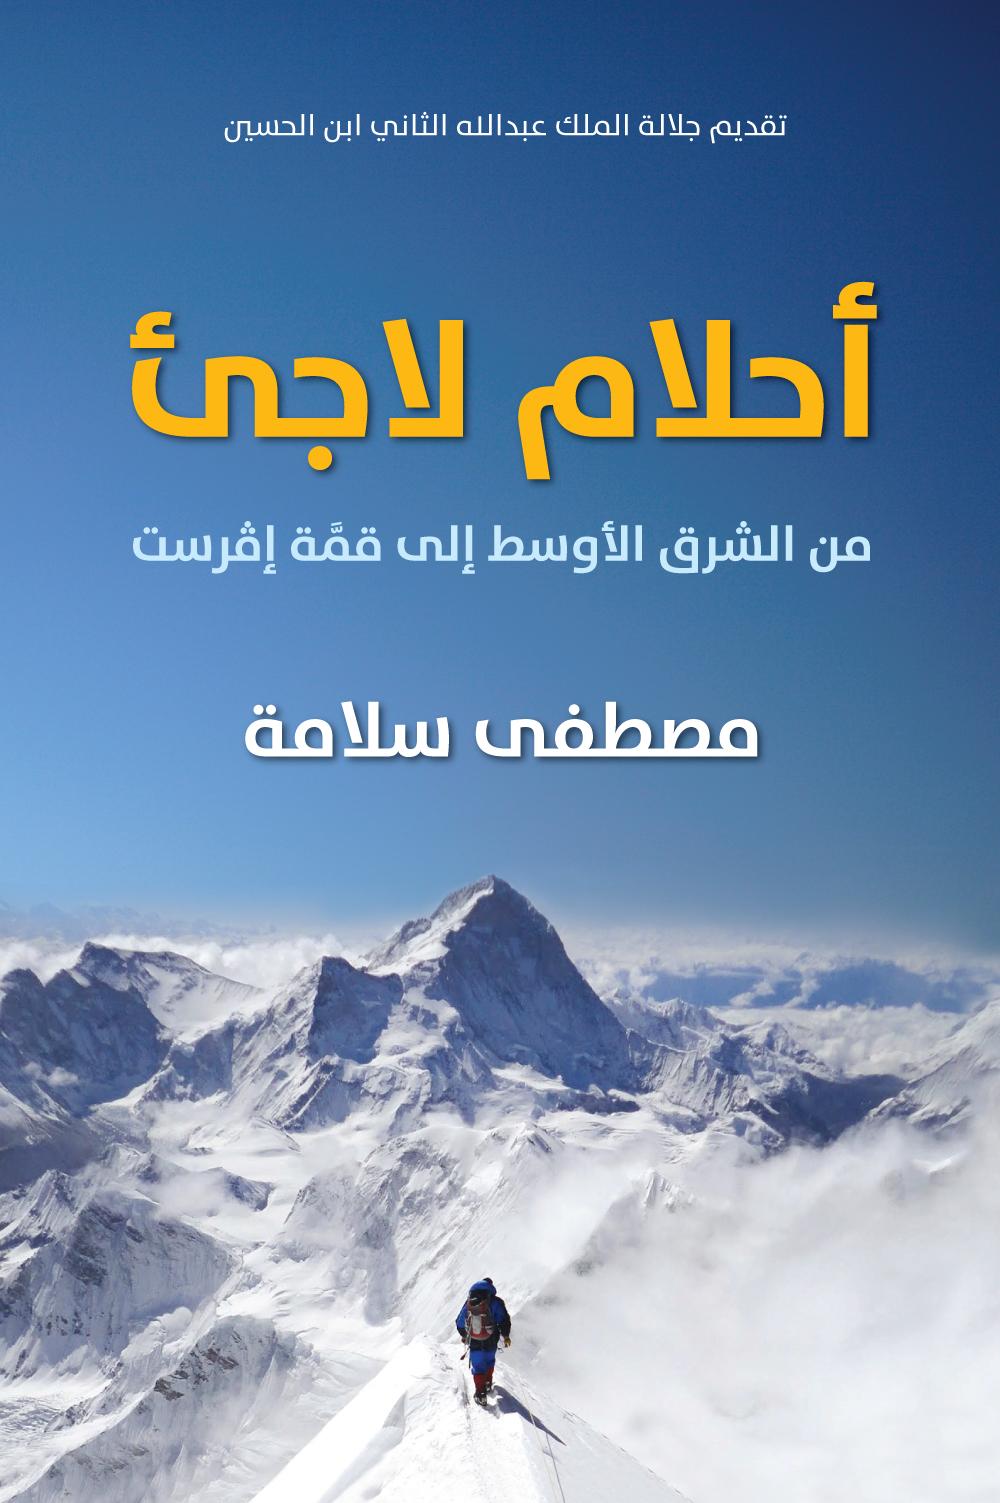 Arabic 2017